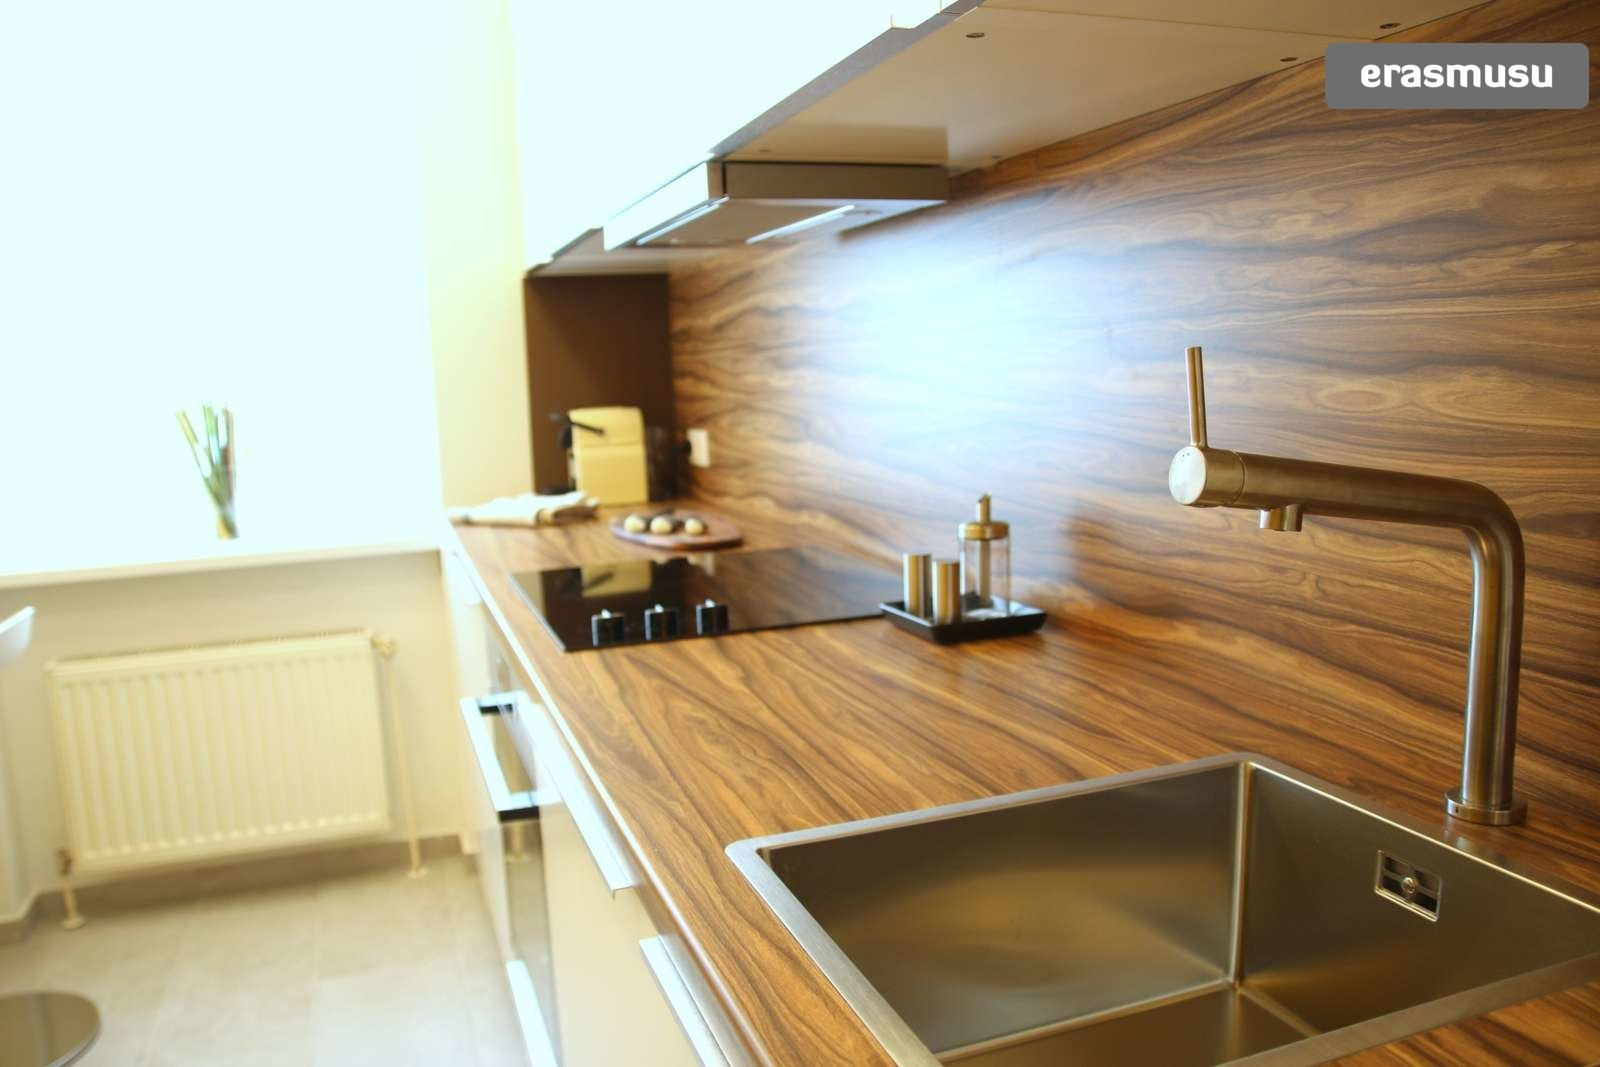 charming-studio-apartment-rent-wahring-9db8f13a949c66a4318e0e56a